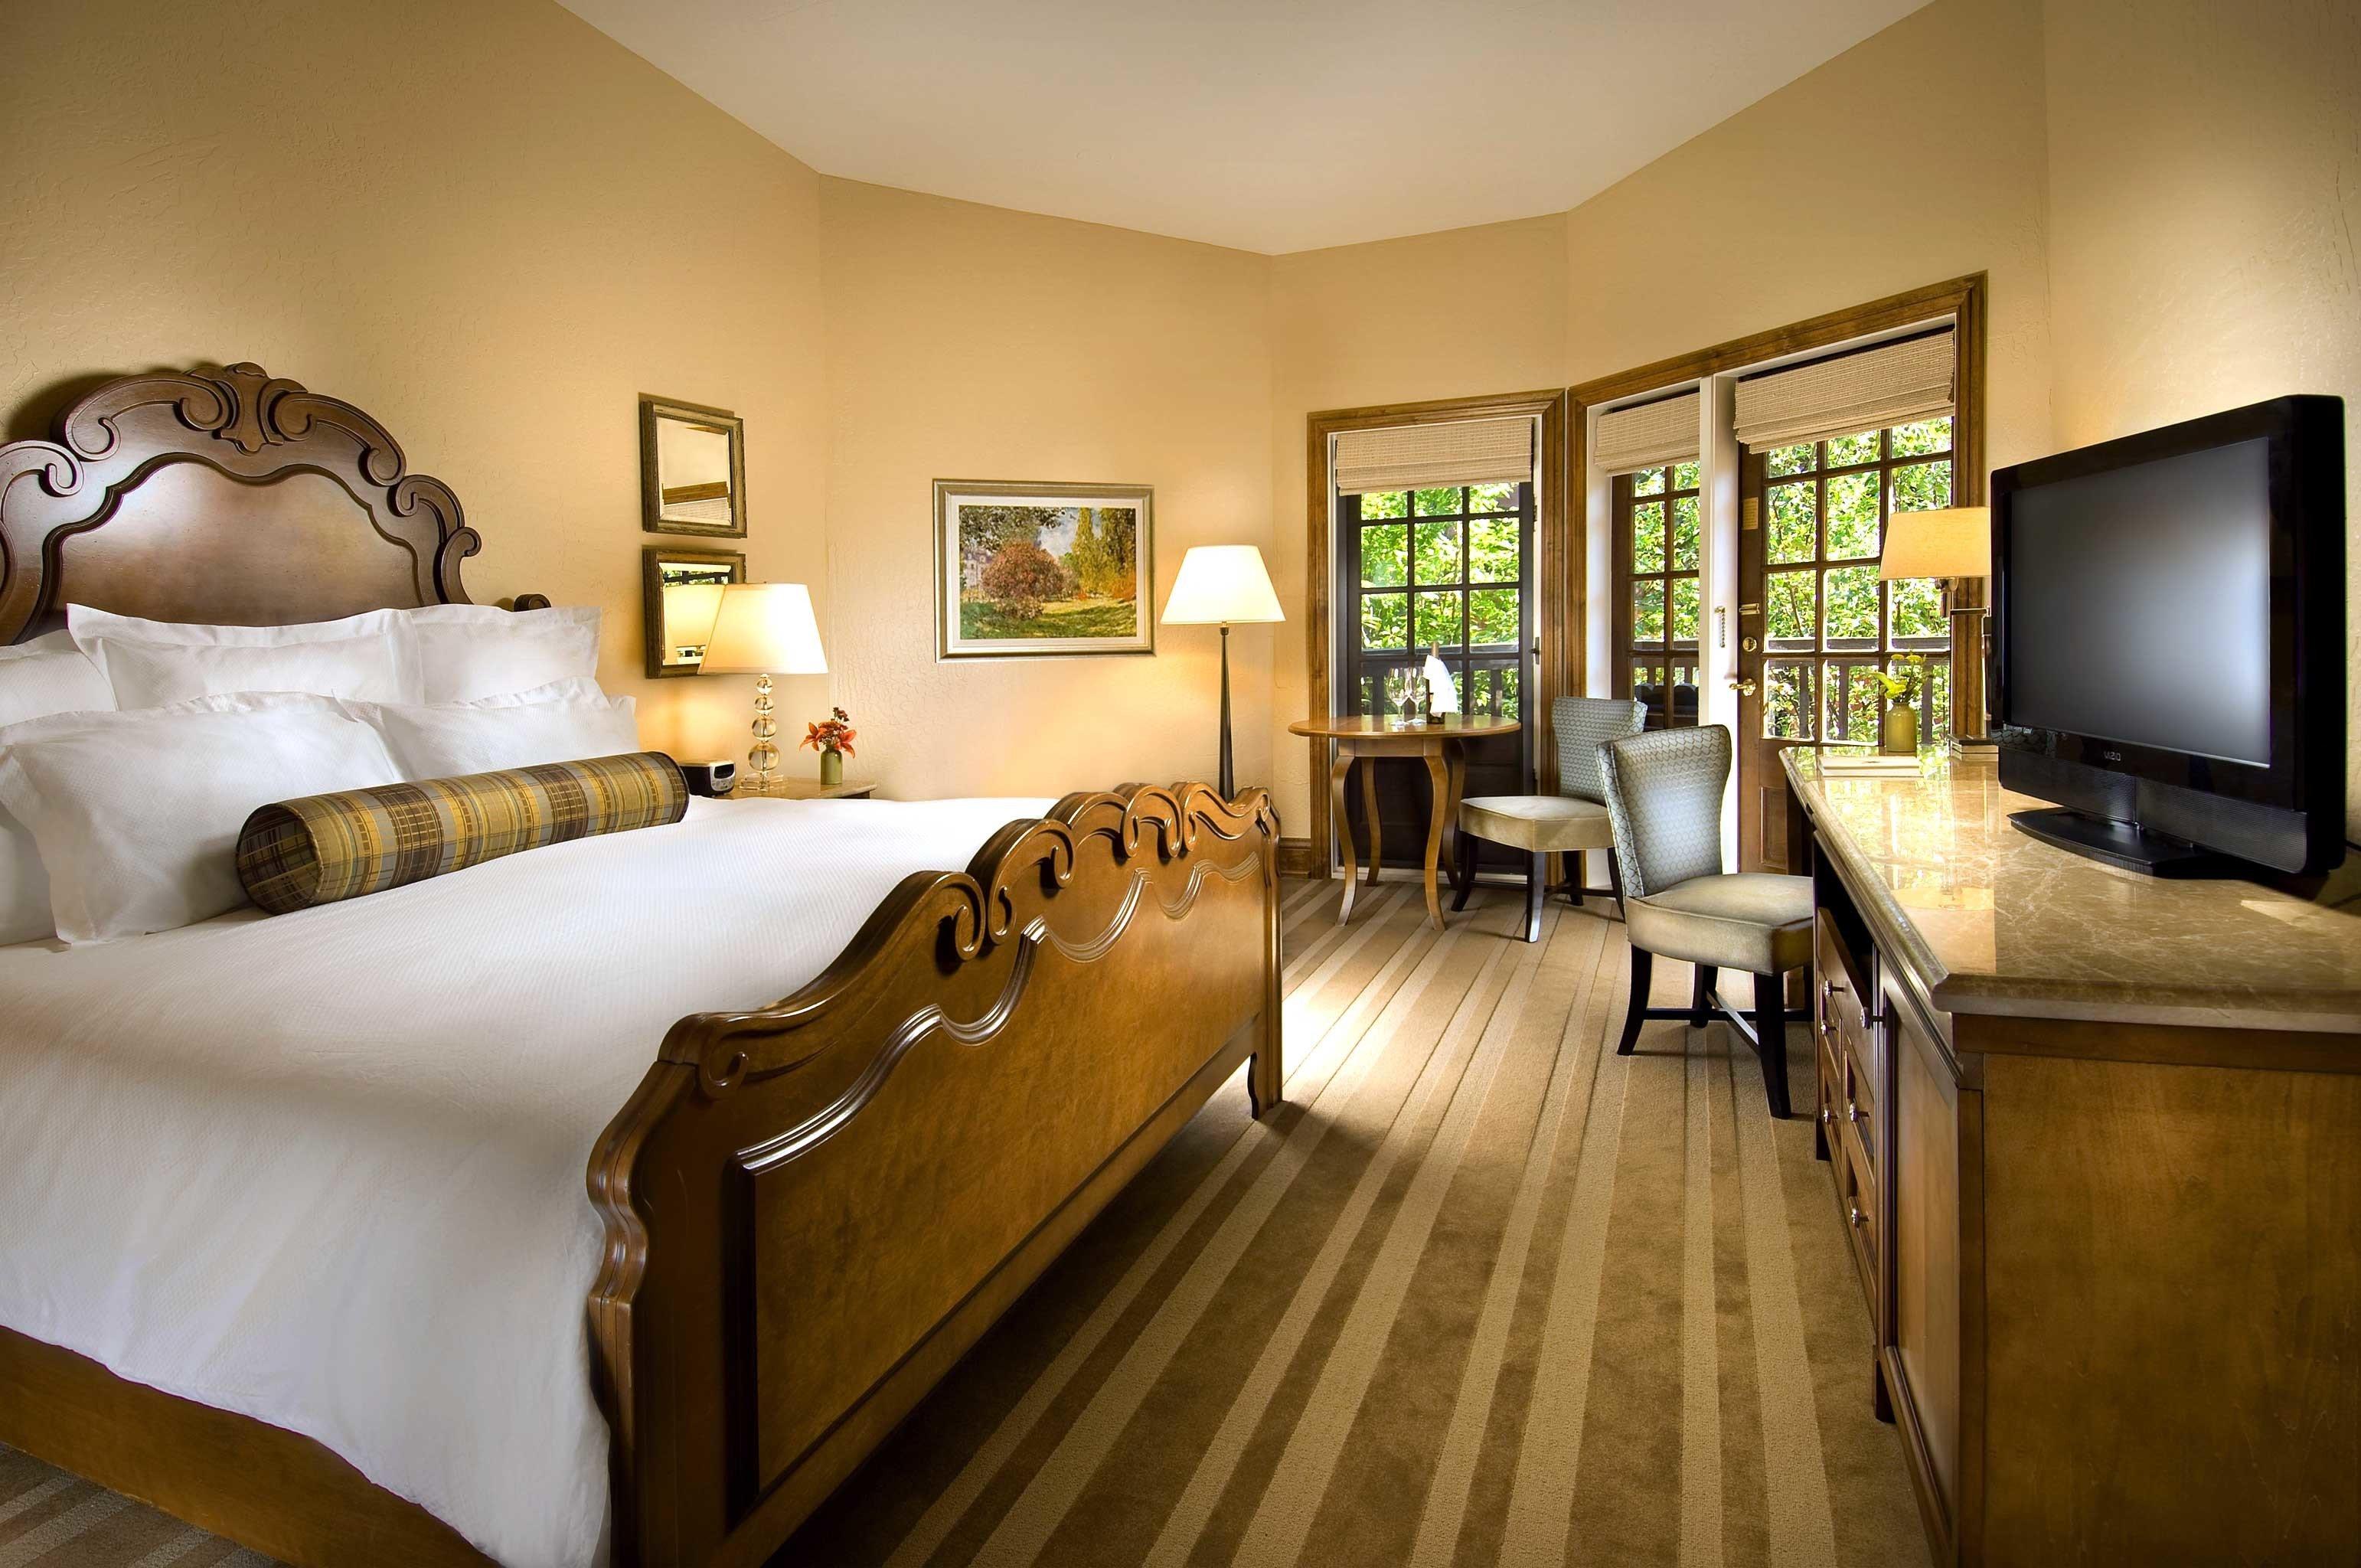 Bedroom Luxury Romance Romantic property living room home Suite